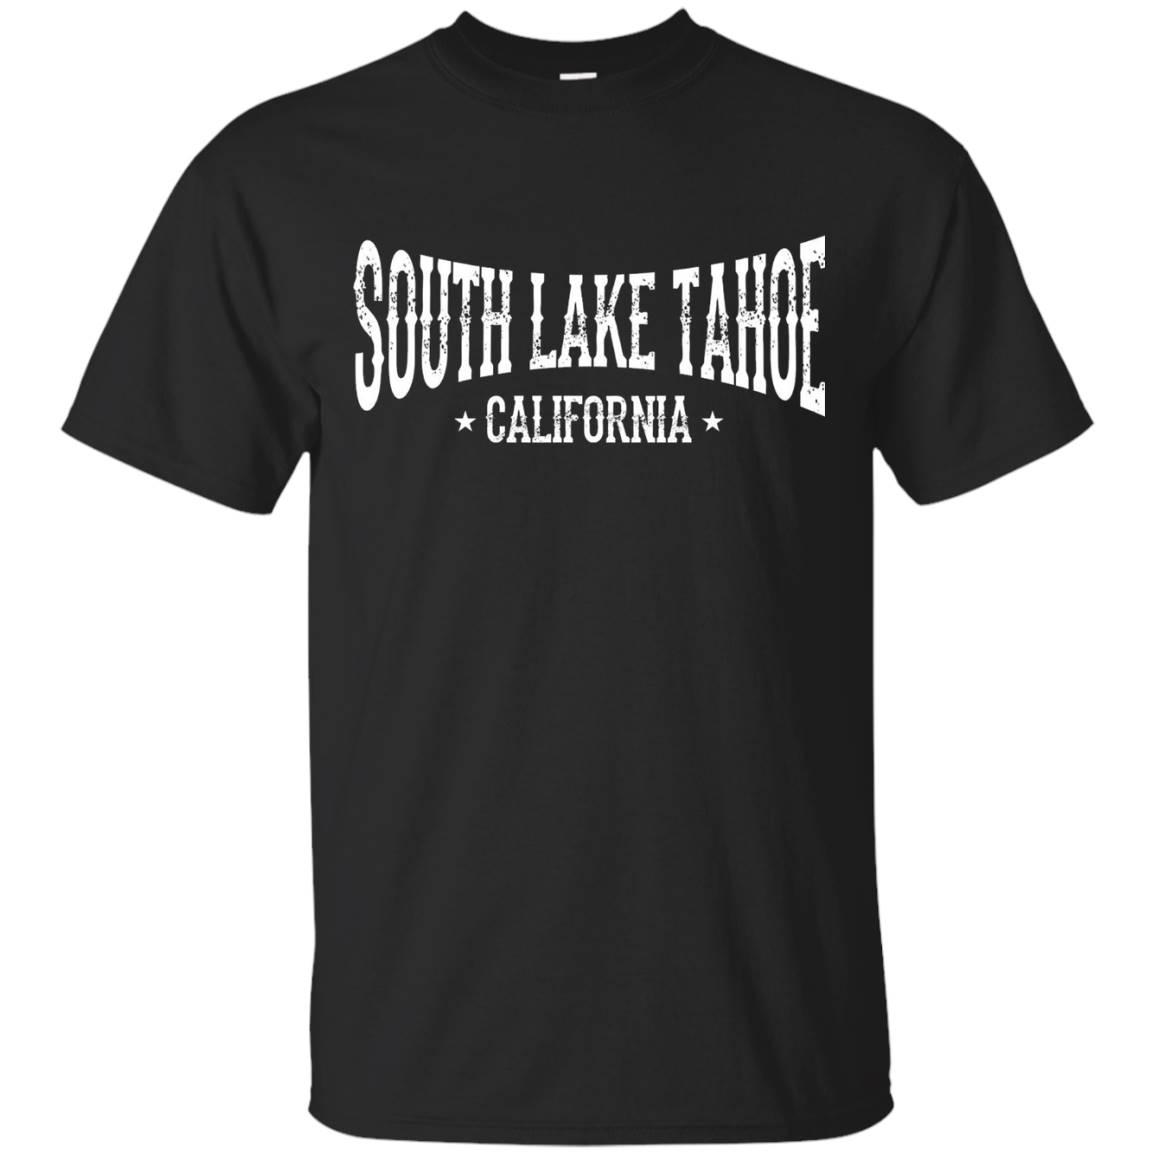 South Lake Tahoe California CA Hometown Souvenir T-Shirt